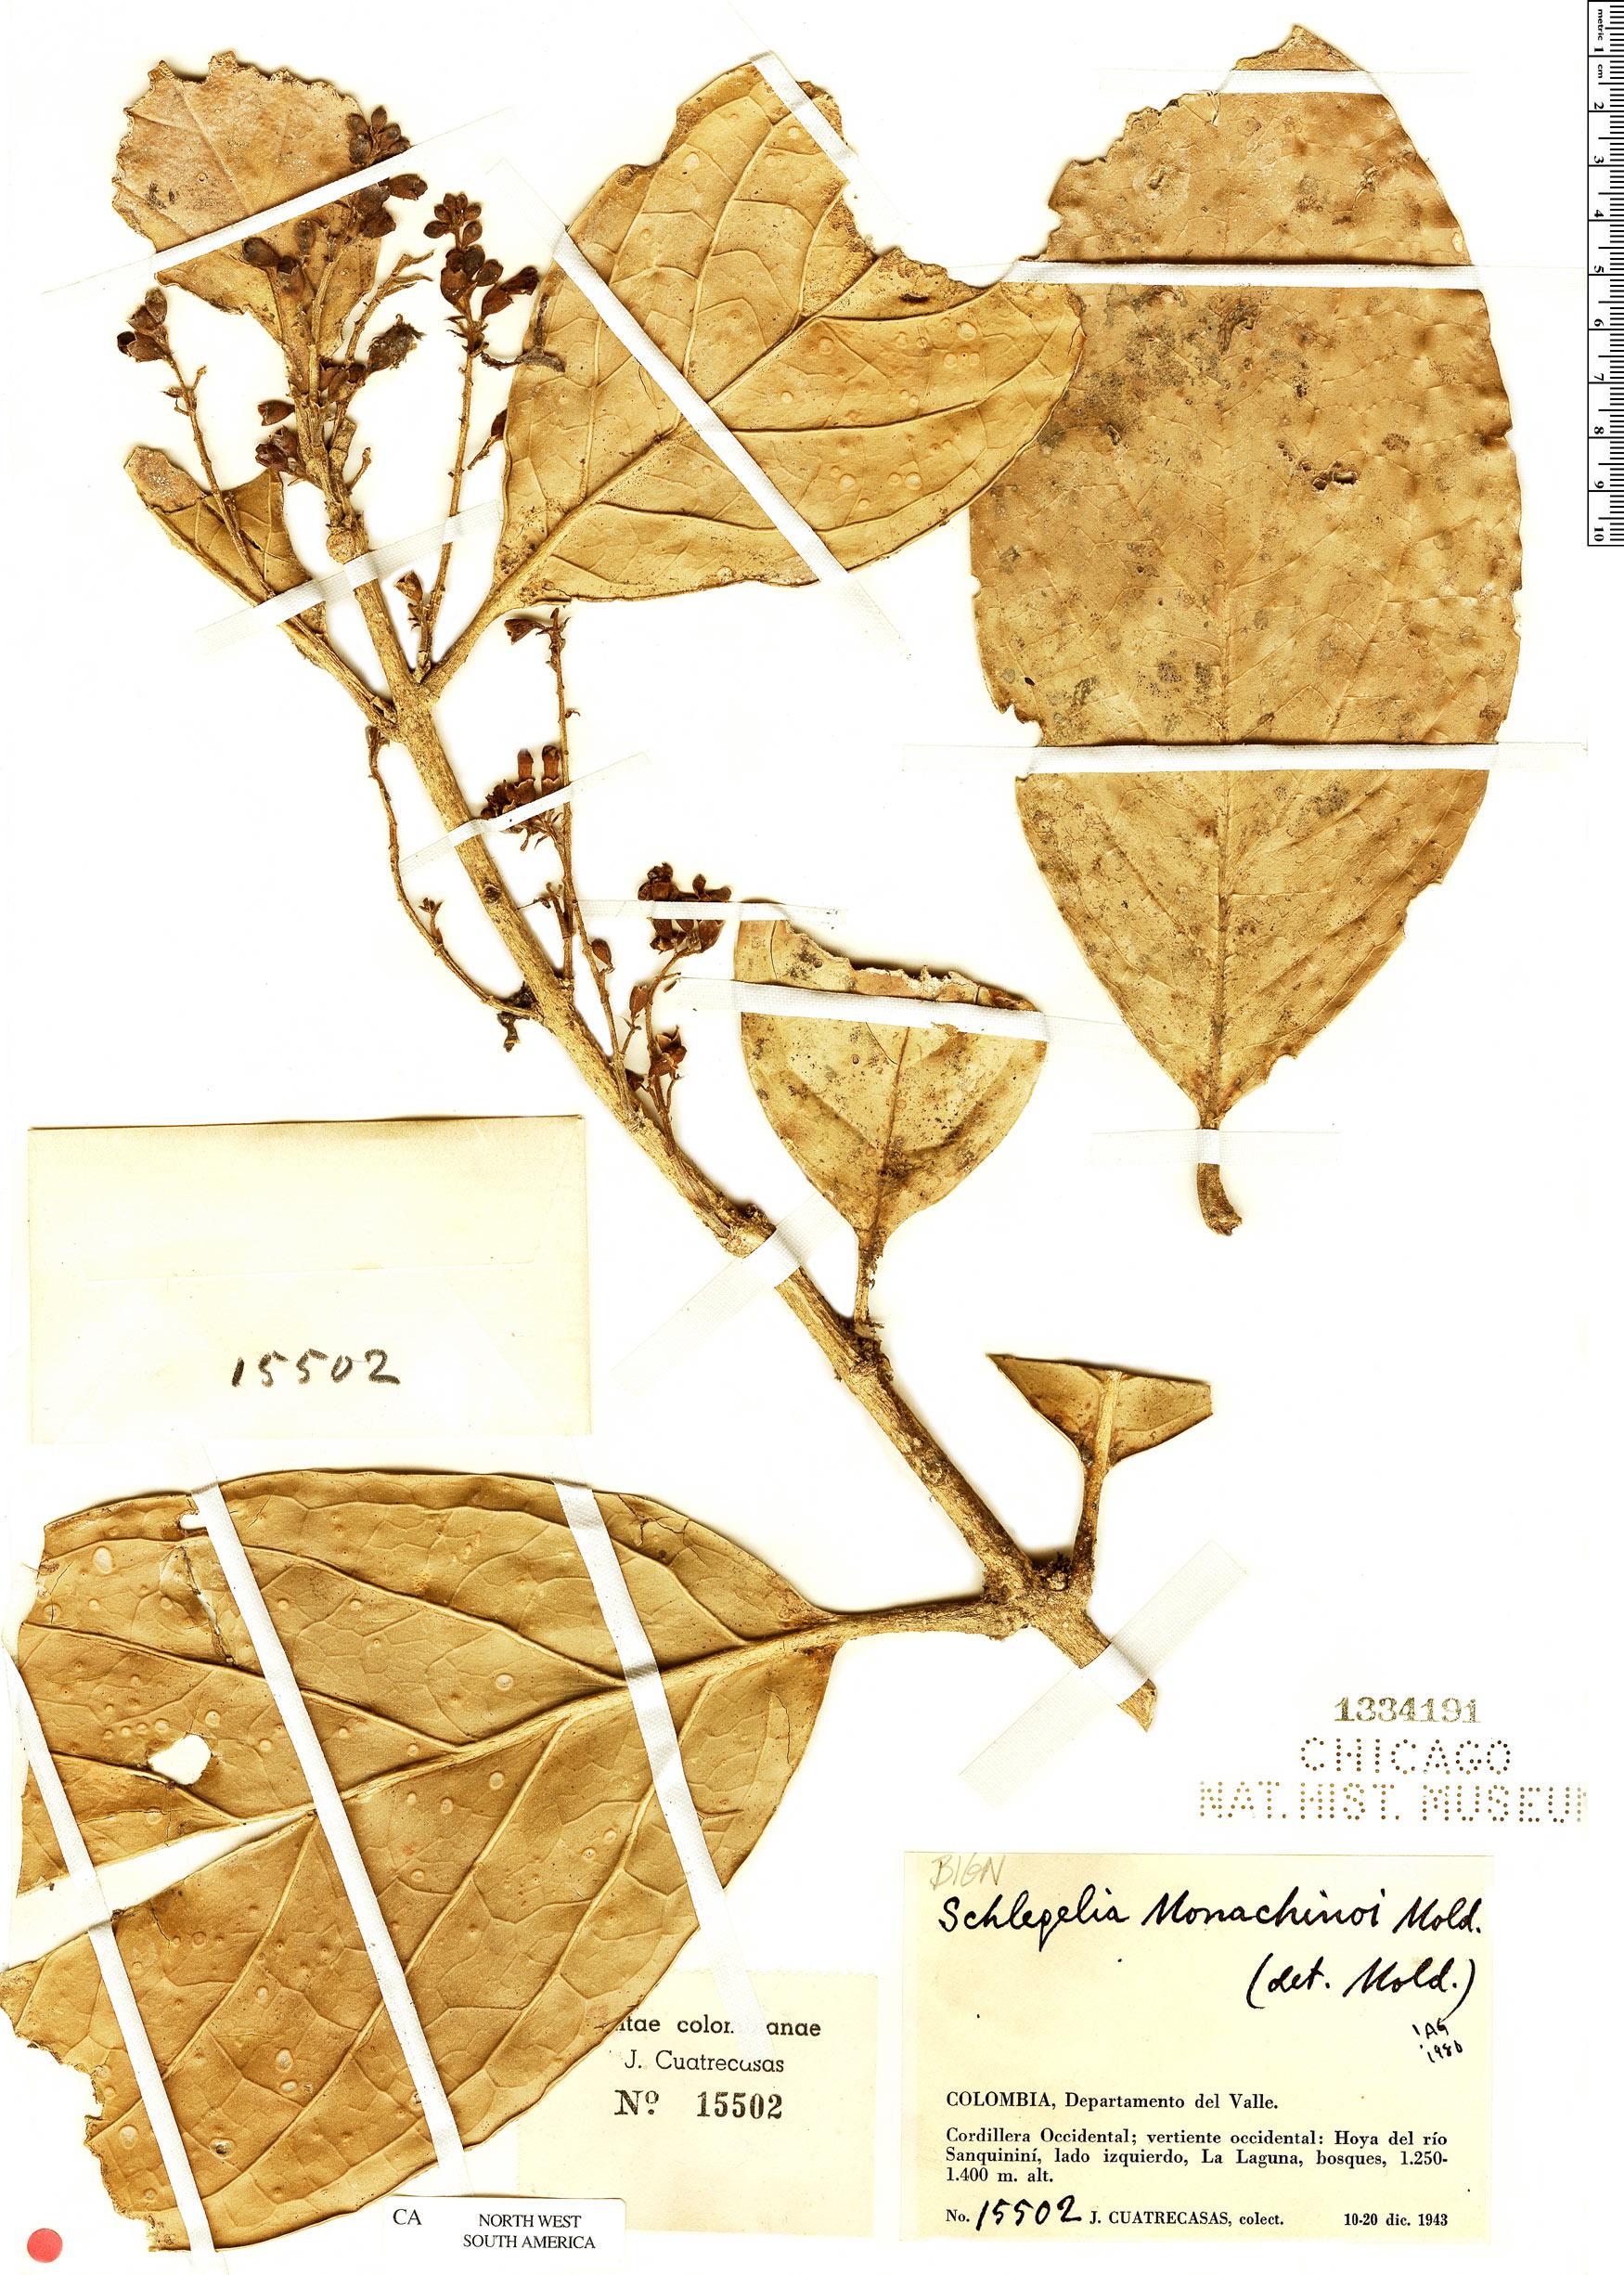 Specimen: Schlegelia monachinoi